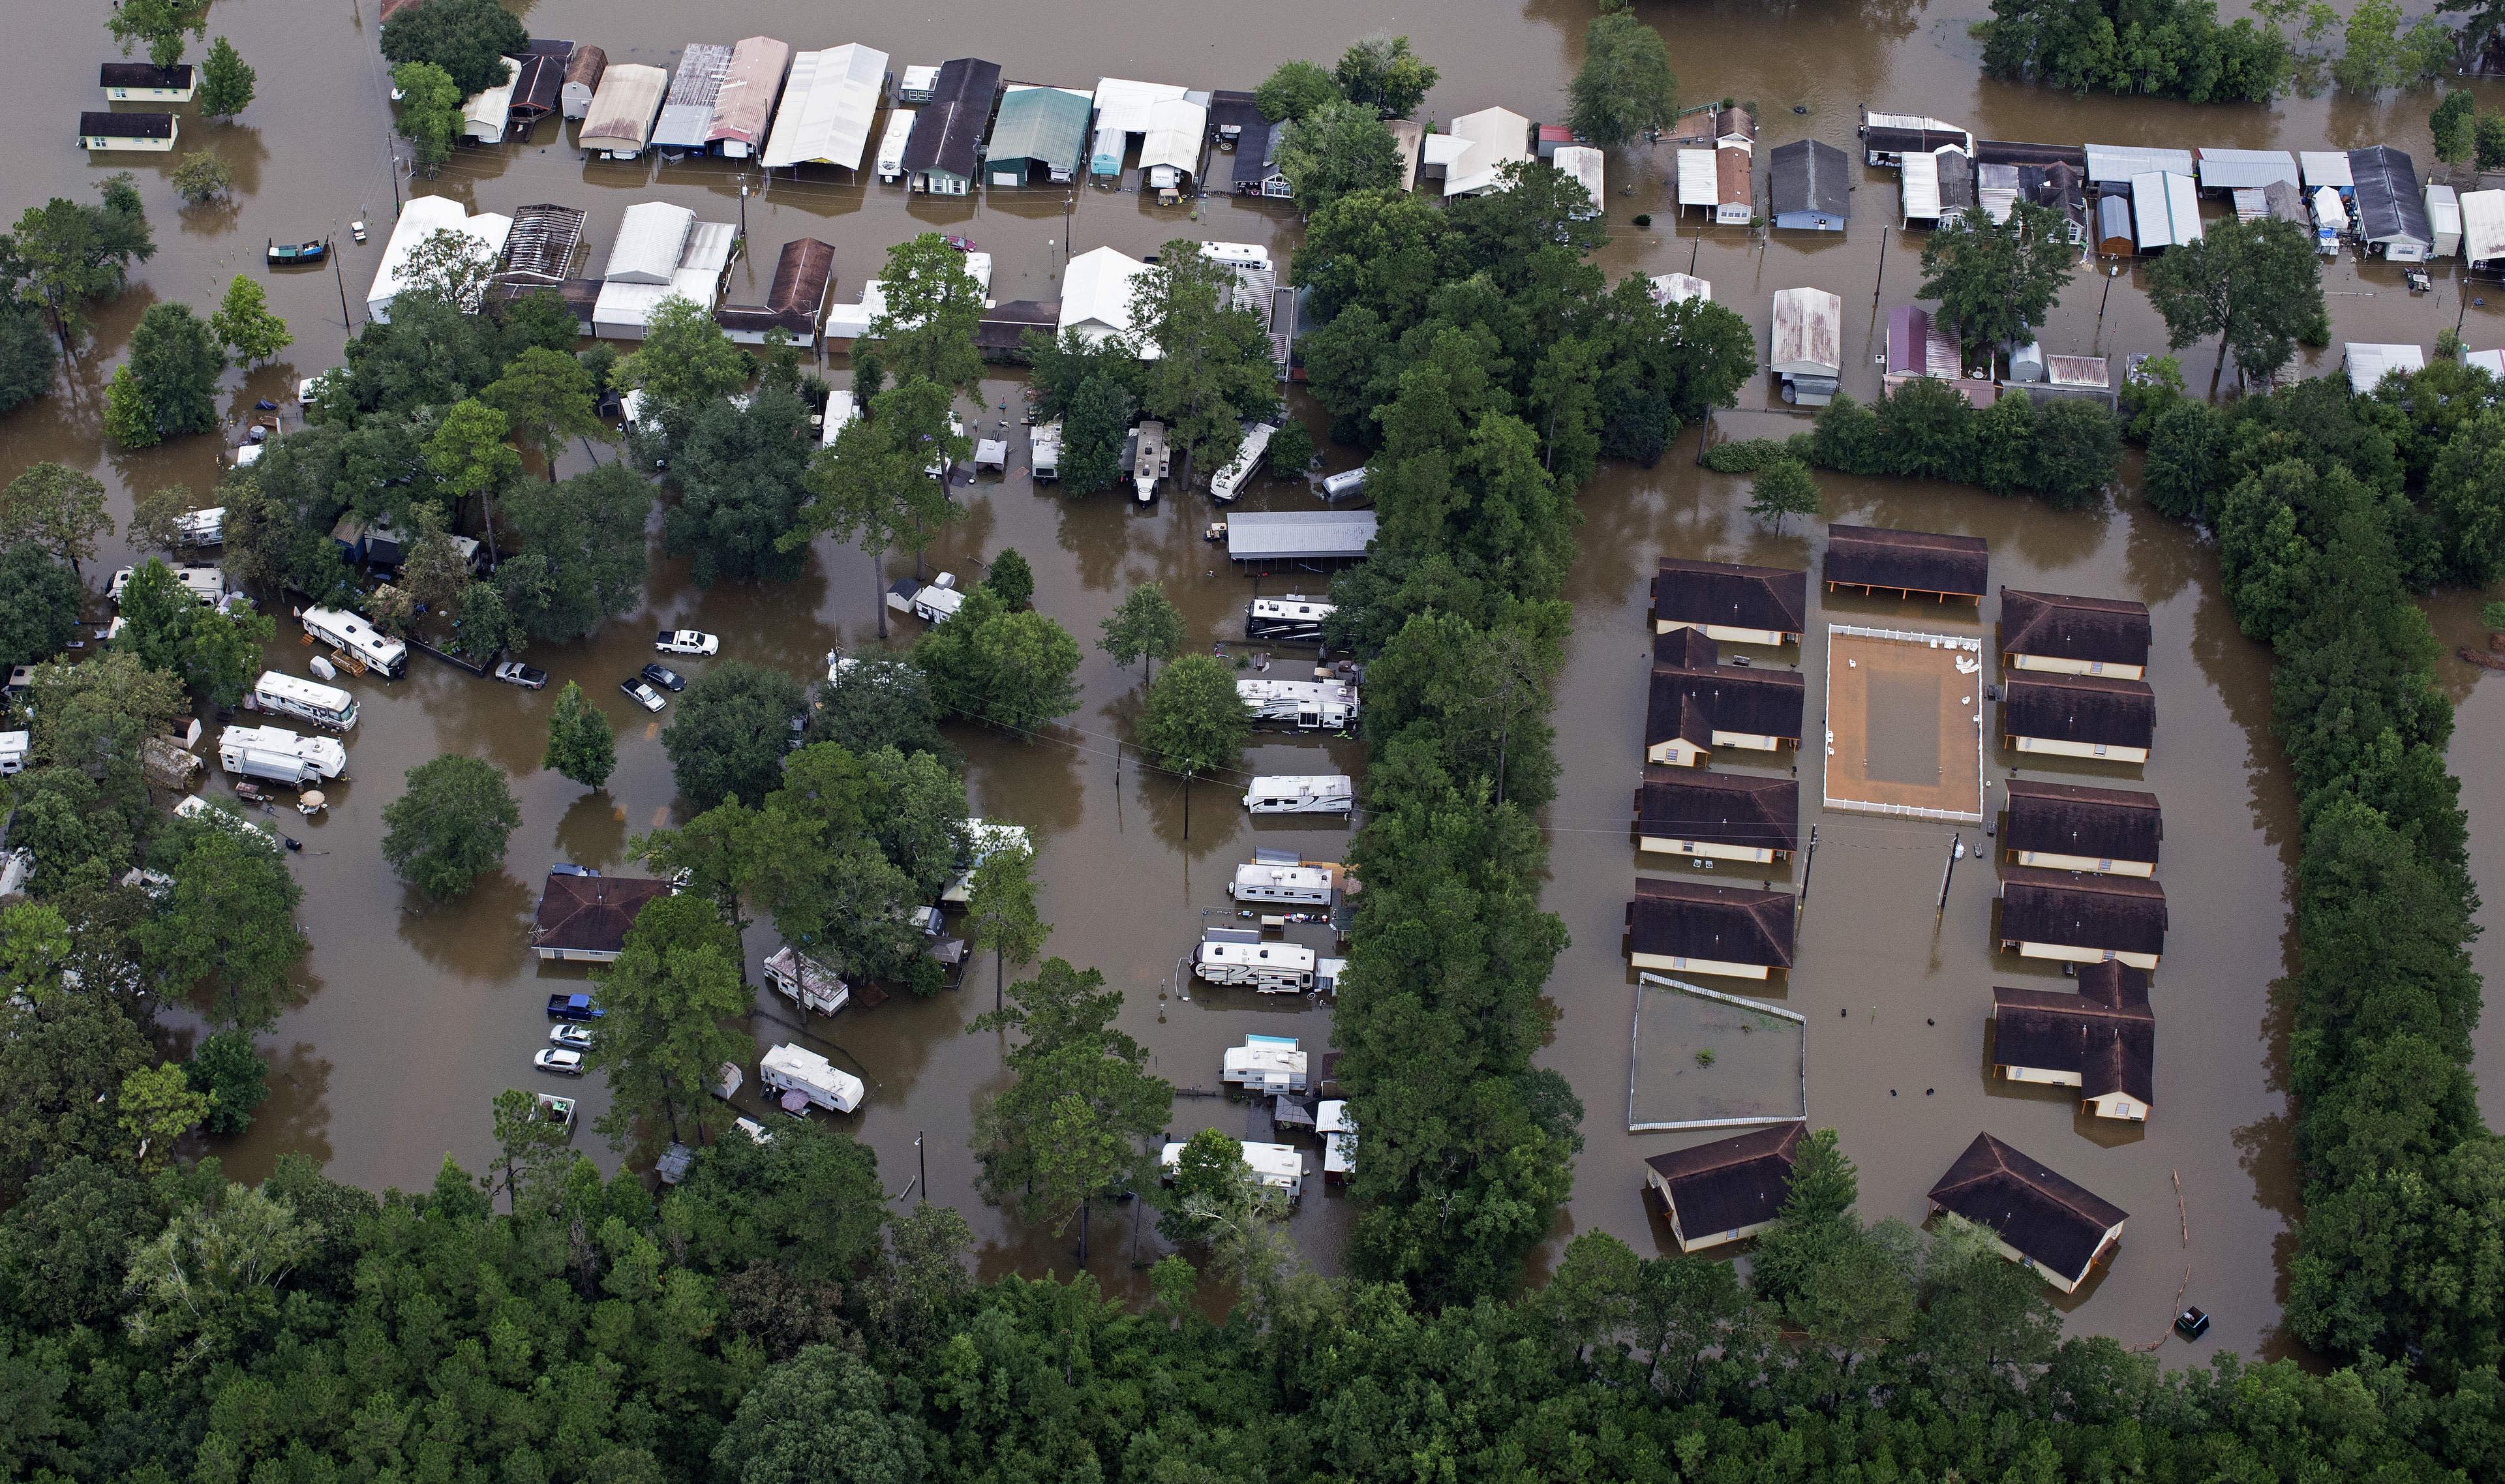 Memories of 2016 flood haunt Baton Rouge ahead of Barry